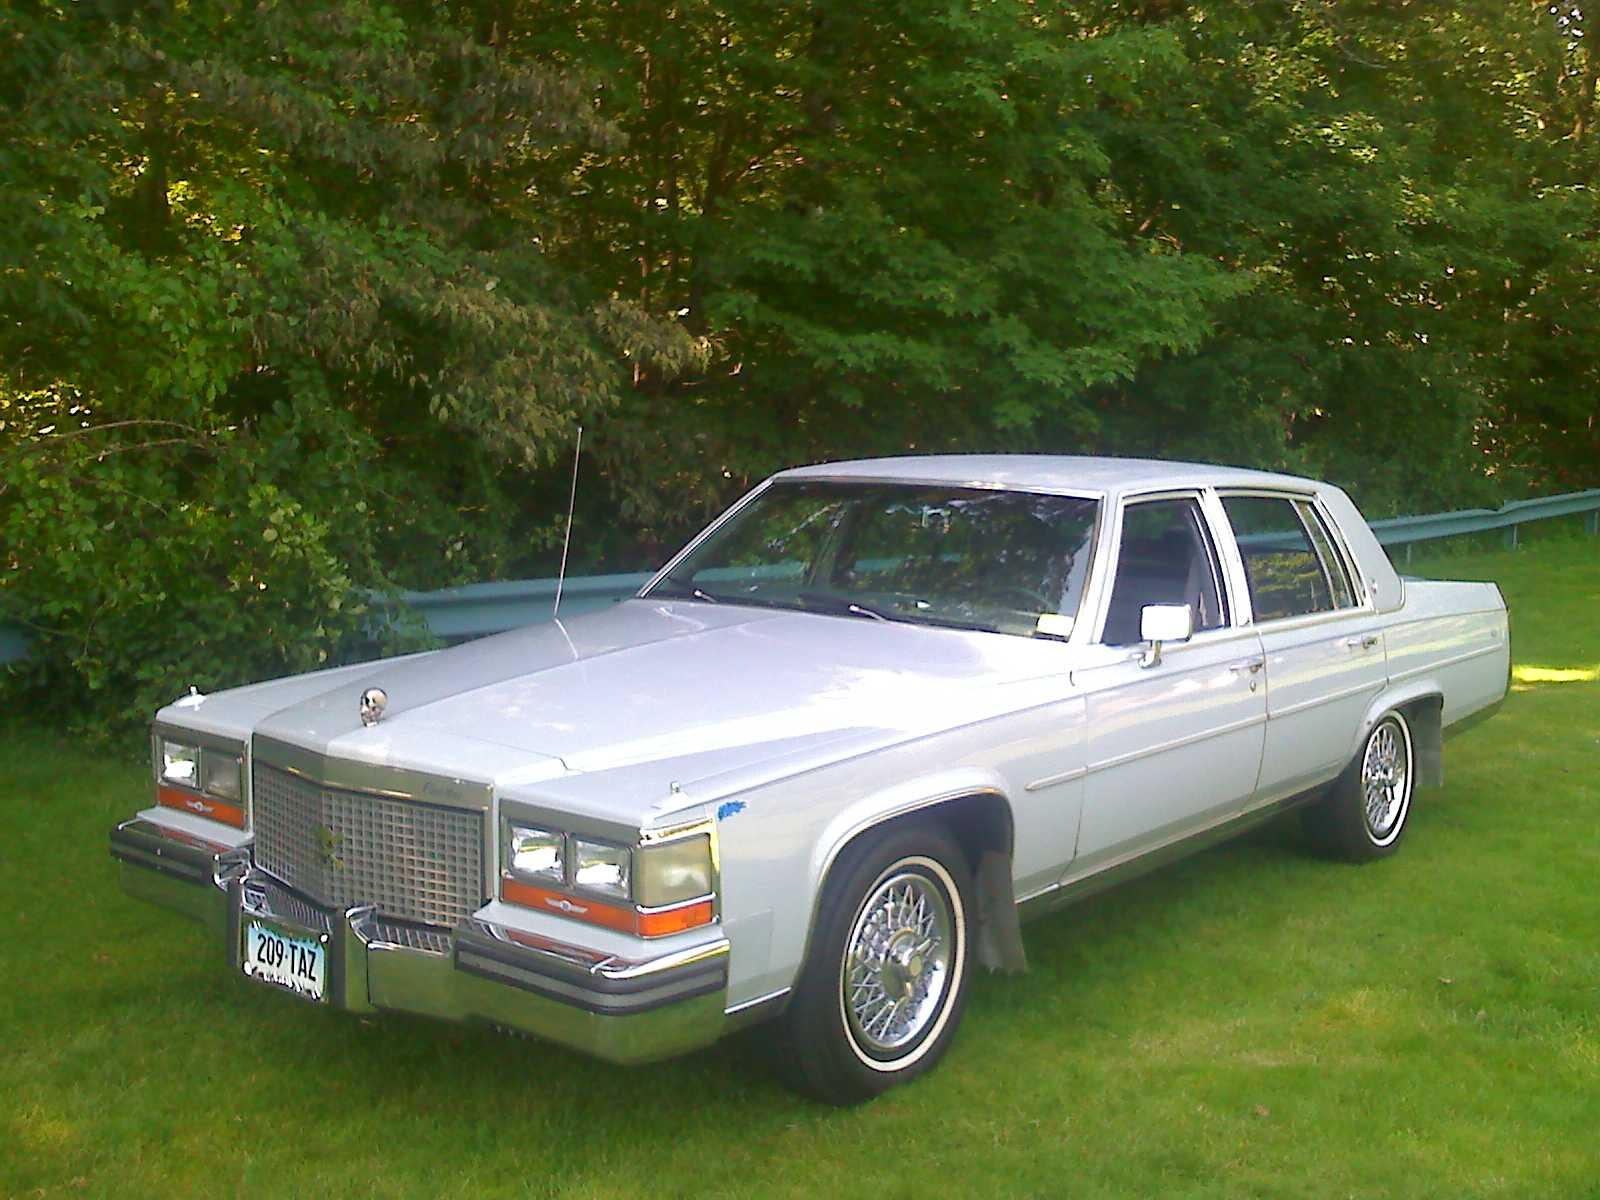 1989 Cadillac Brougham - Overview - CarGurus